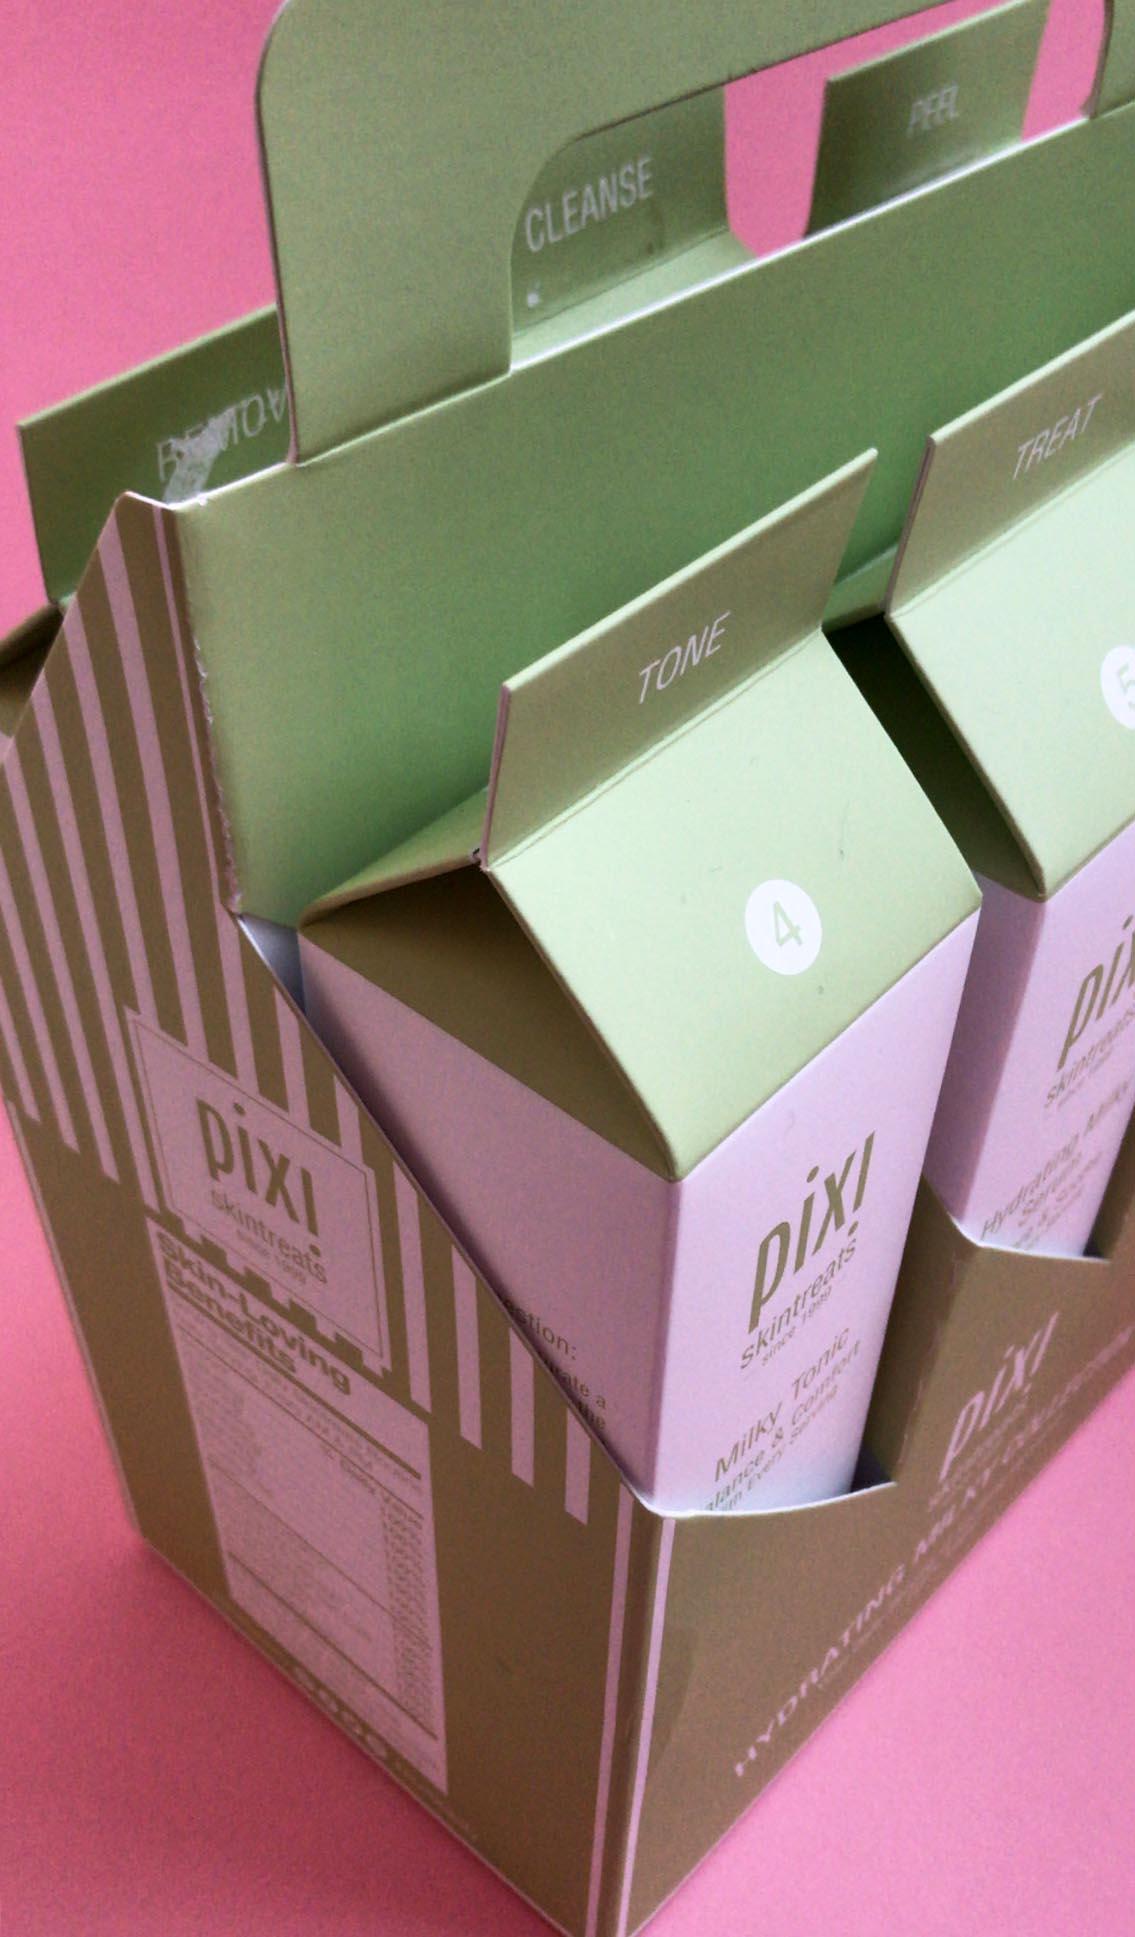 pixi milky review.JPG